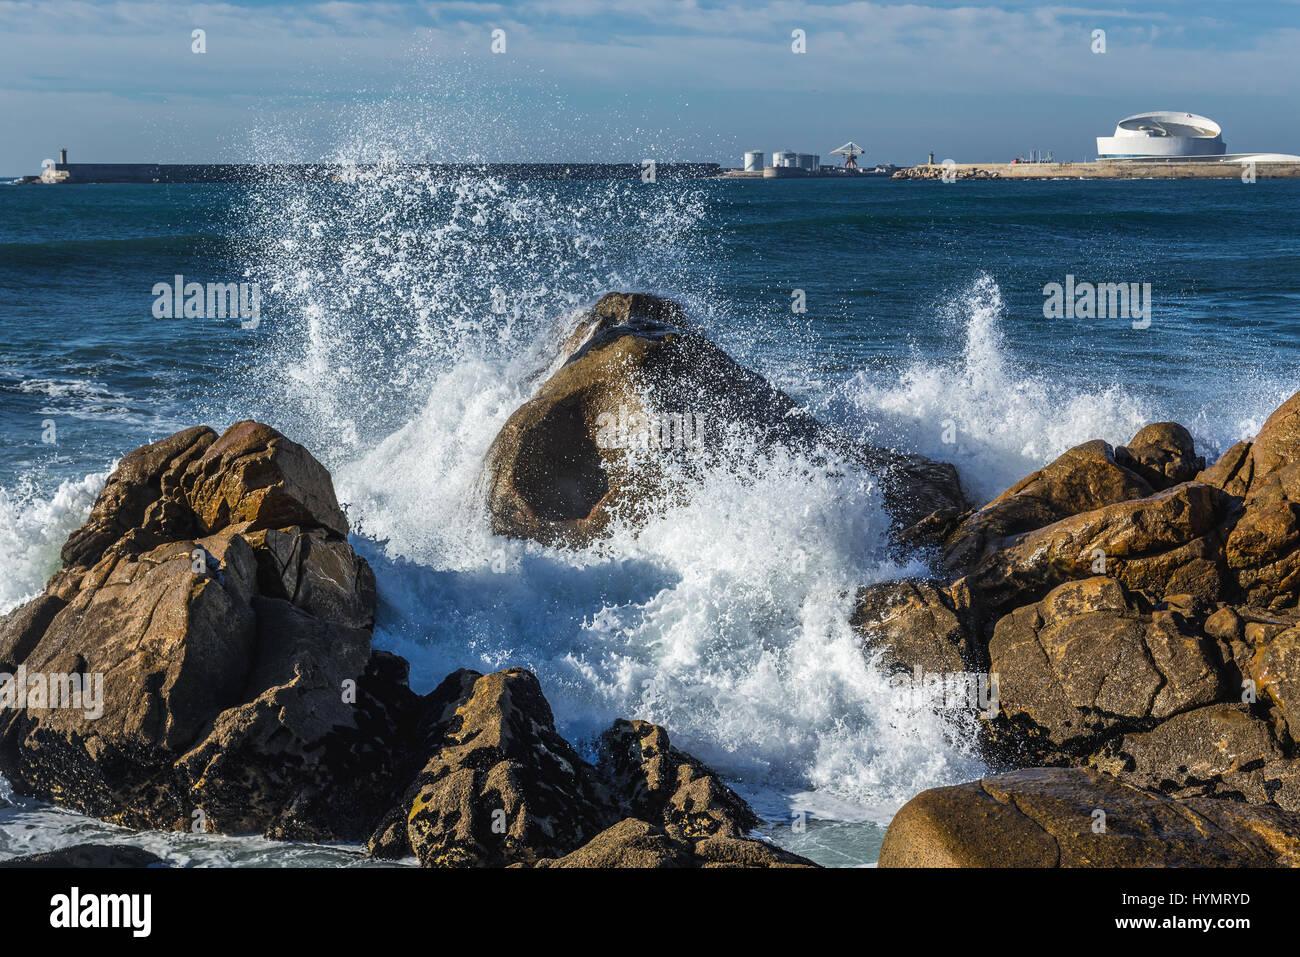 Waves smashing against rocks on the beach in Nevogilde civil parish of Porto, Portugal. Port of Leixoes Cruise Terminal Stock Photo